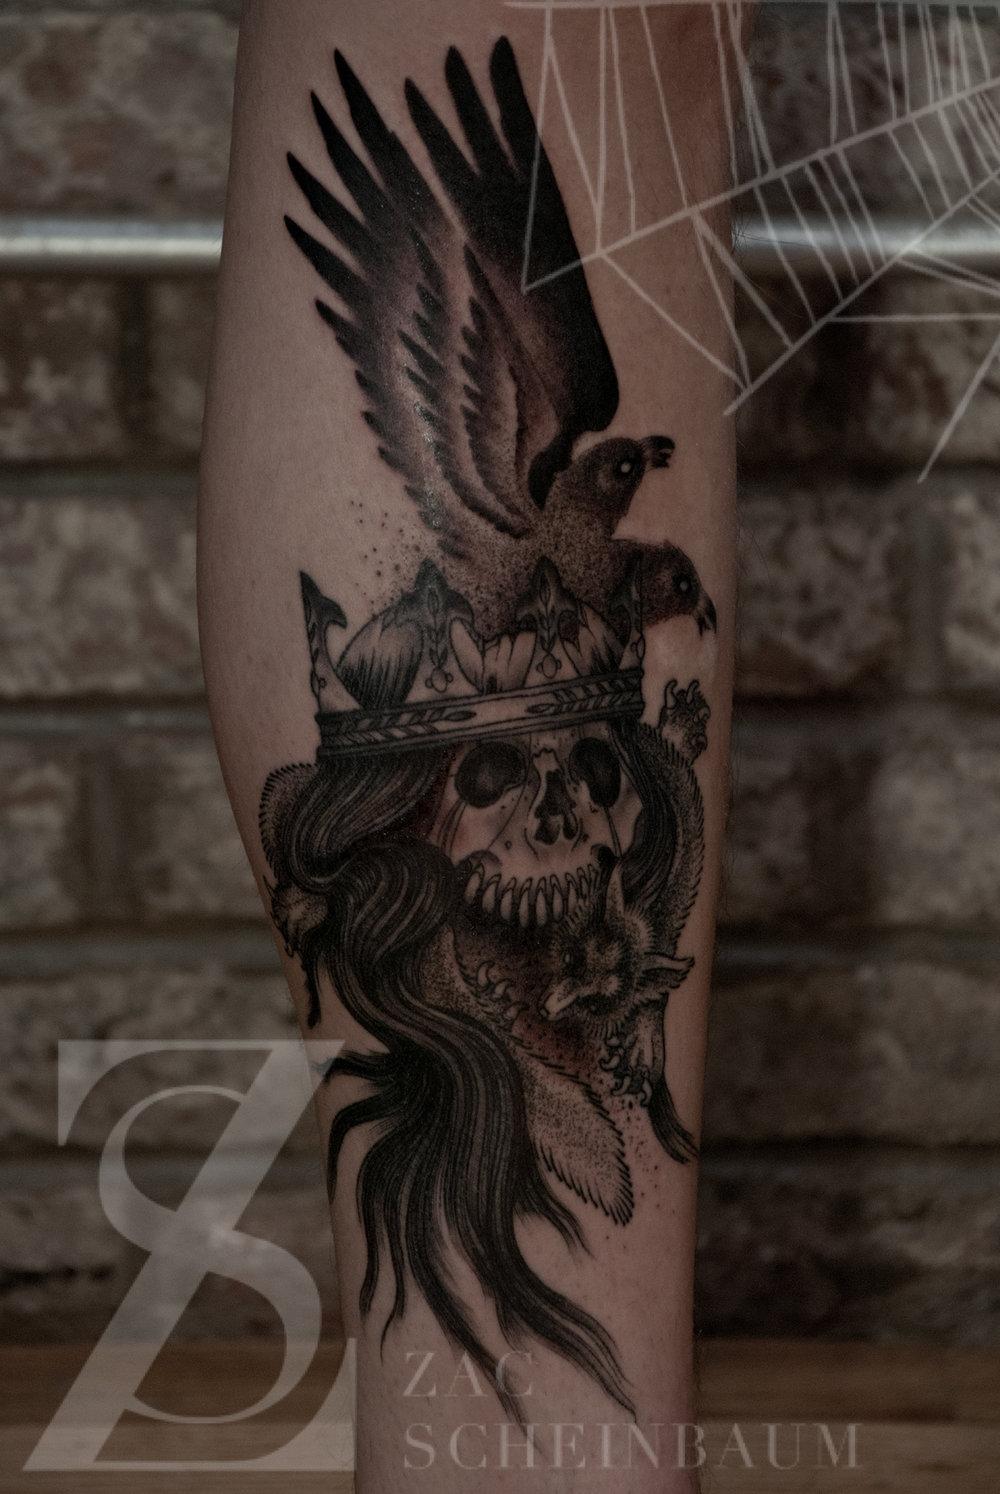 zac-scheinbaum-saved-tattoo-skull-and-ravens-2011-2011-1.jpg